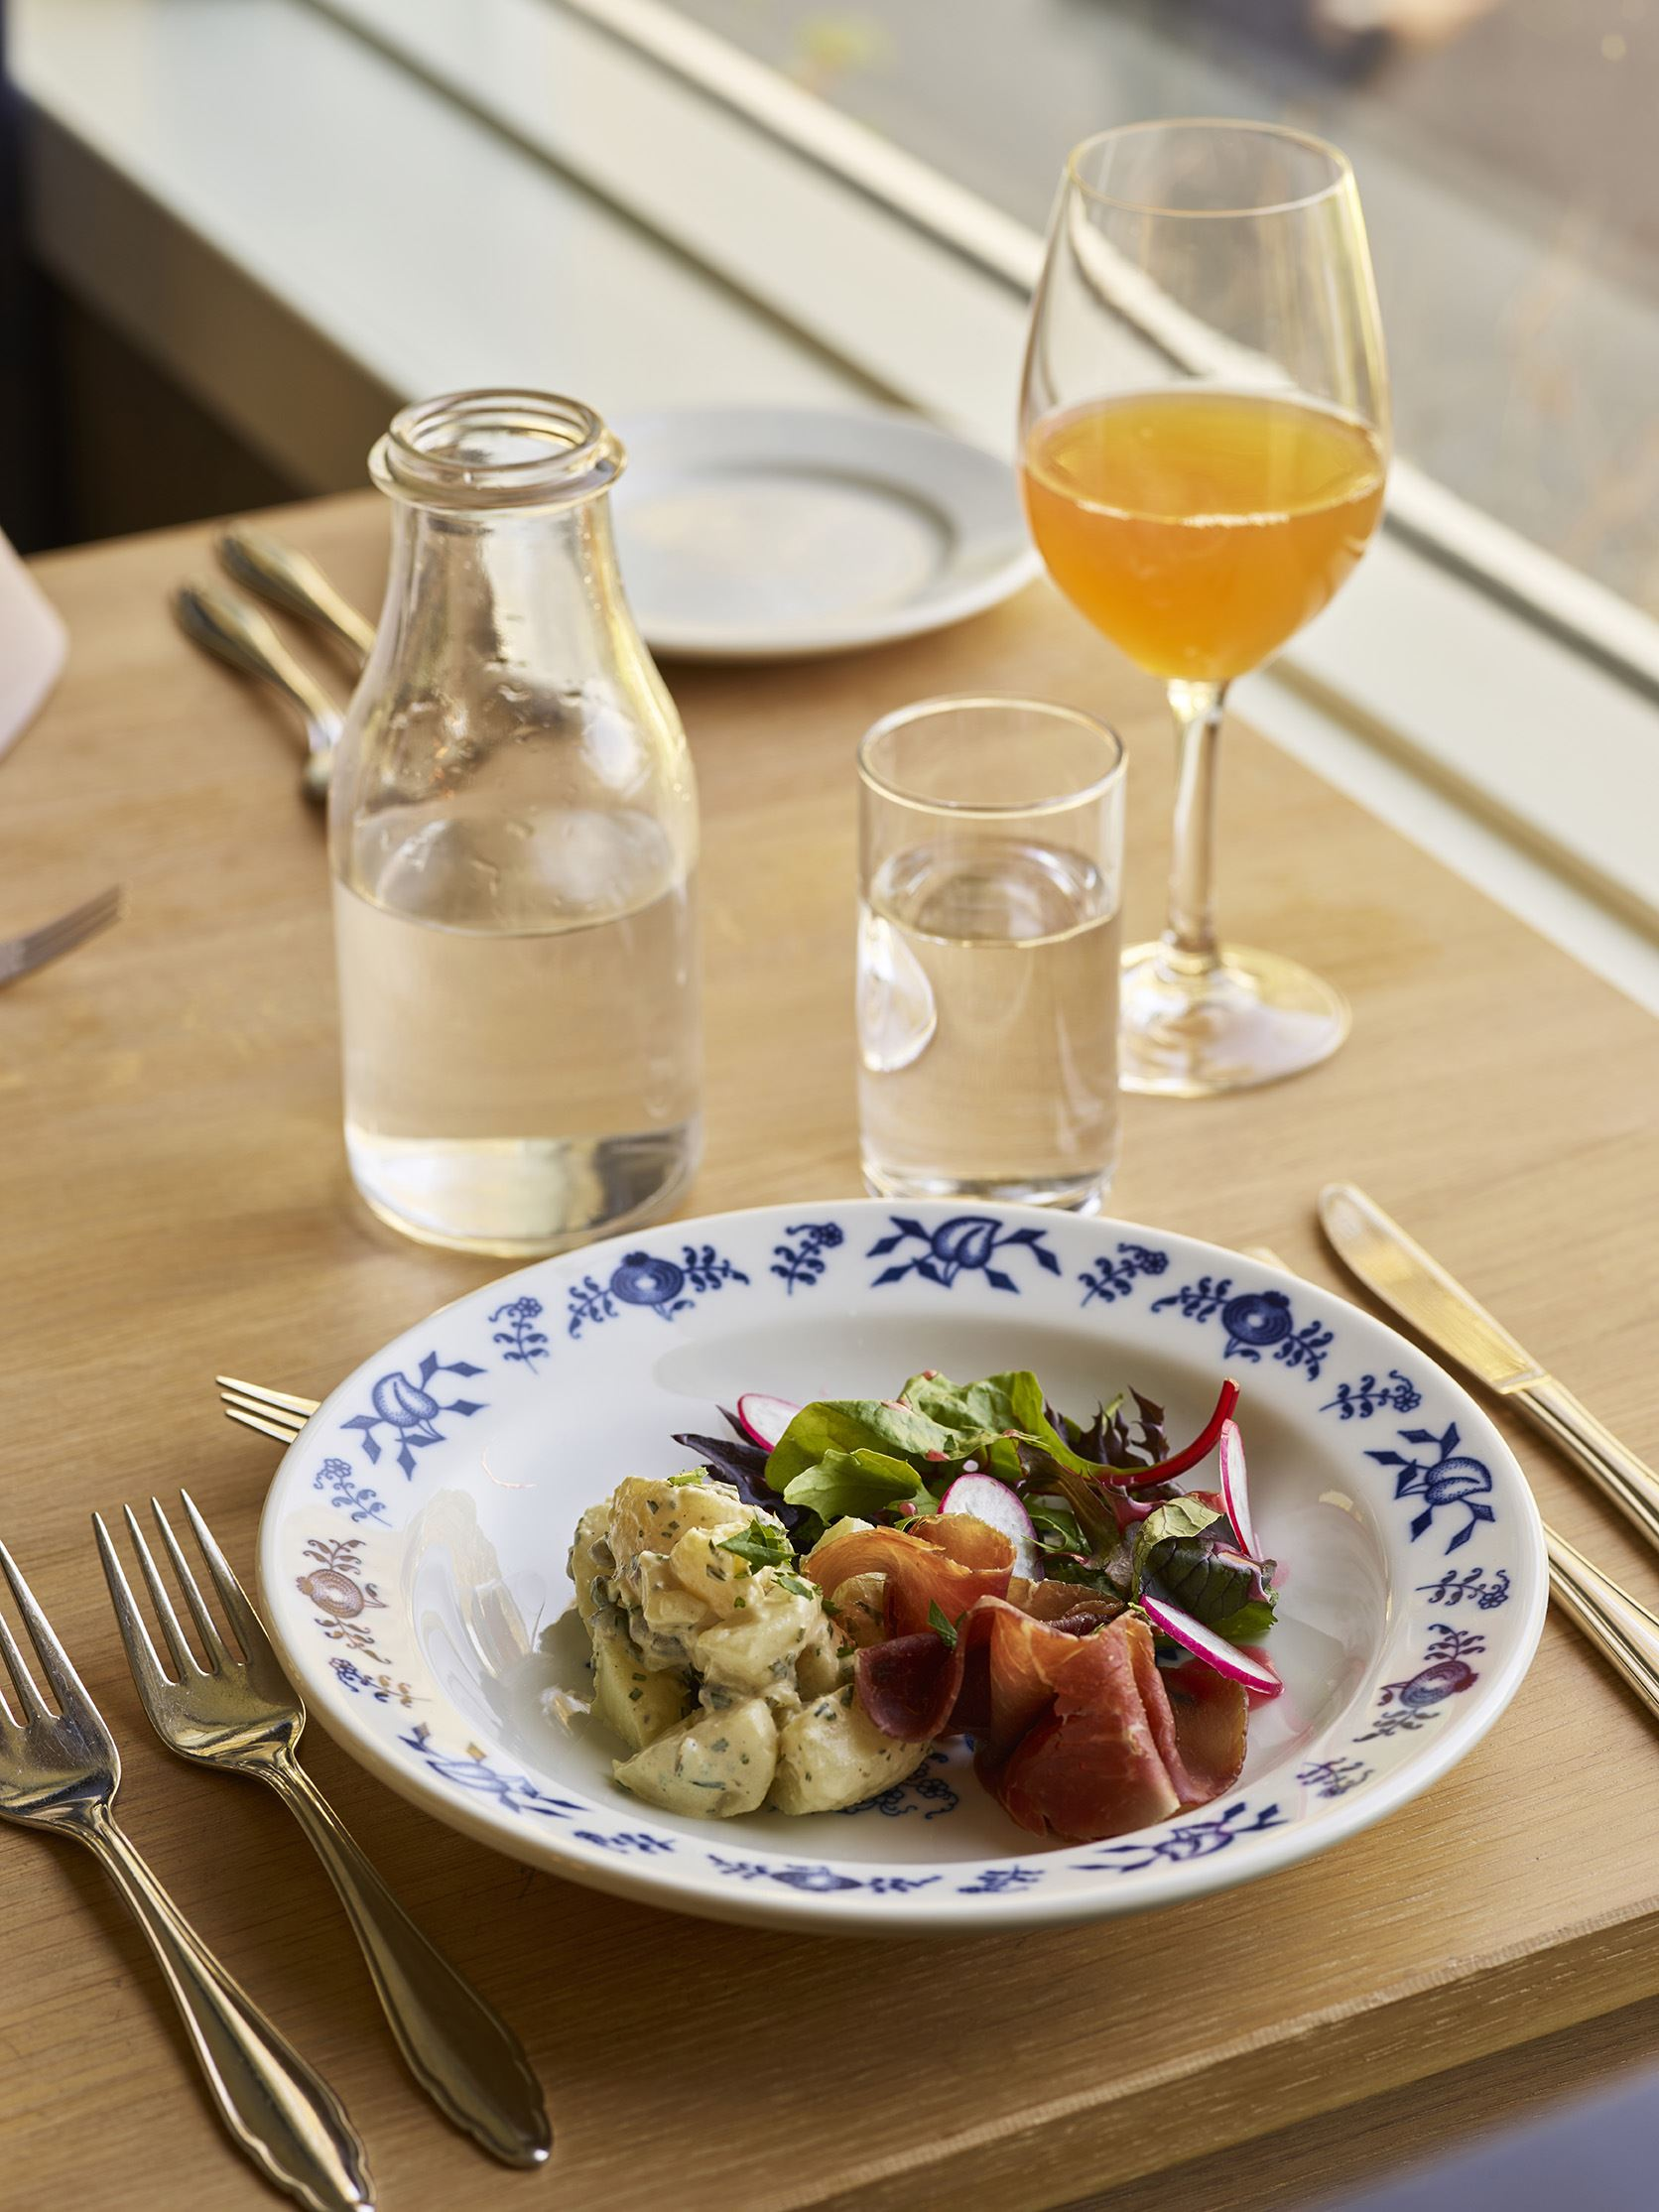 Ragnar Hartvig 2017, Enjoy a good meal in beautiful surroundings